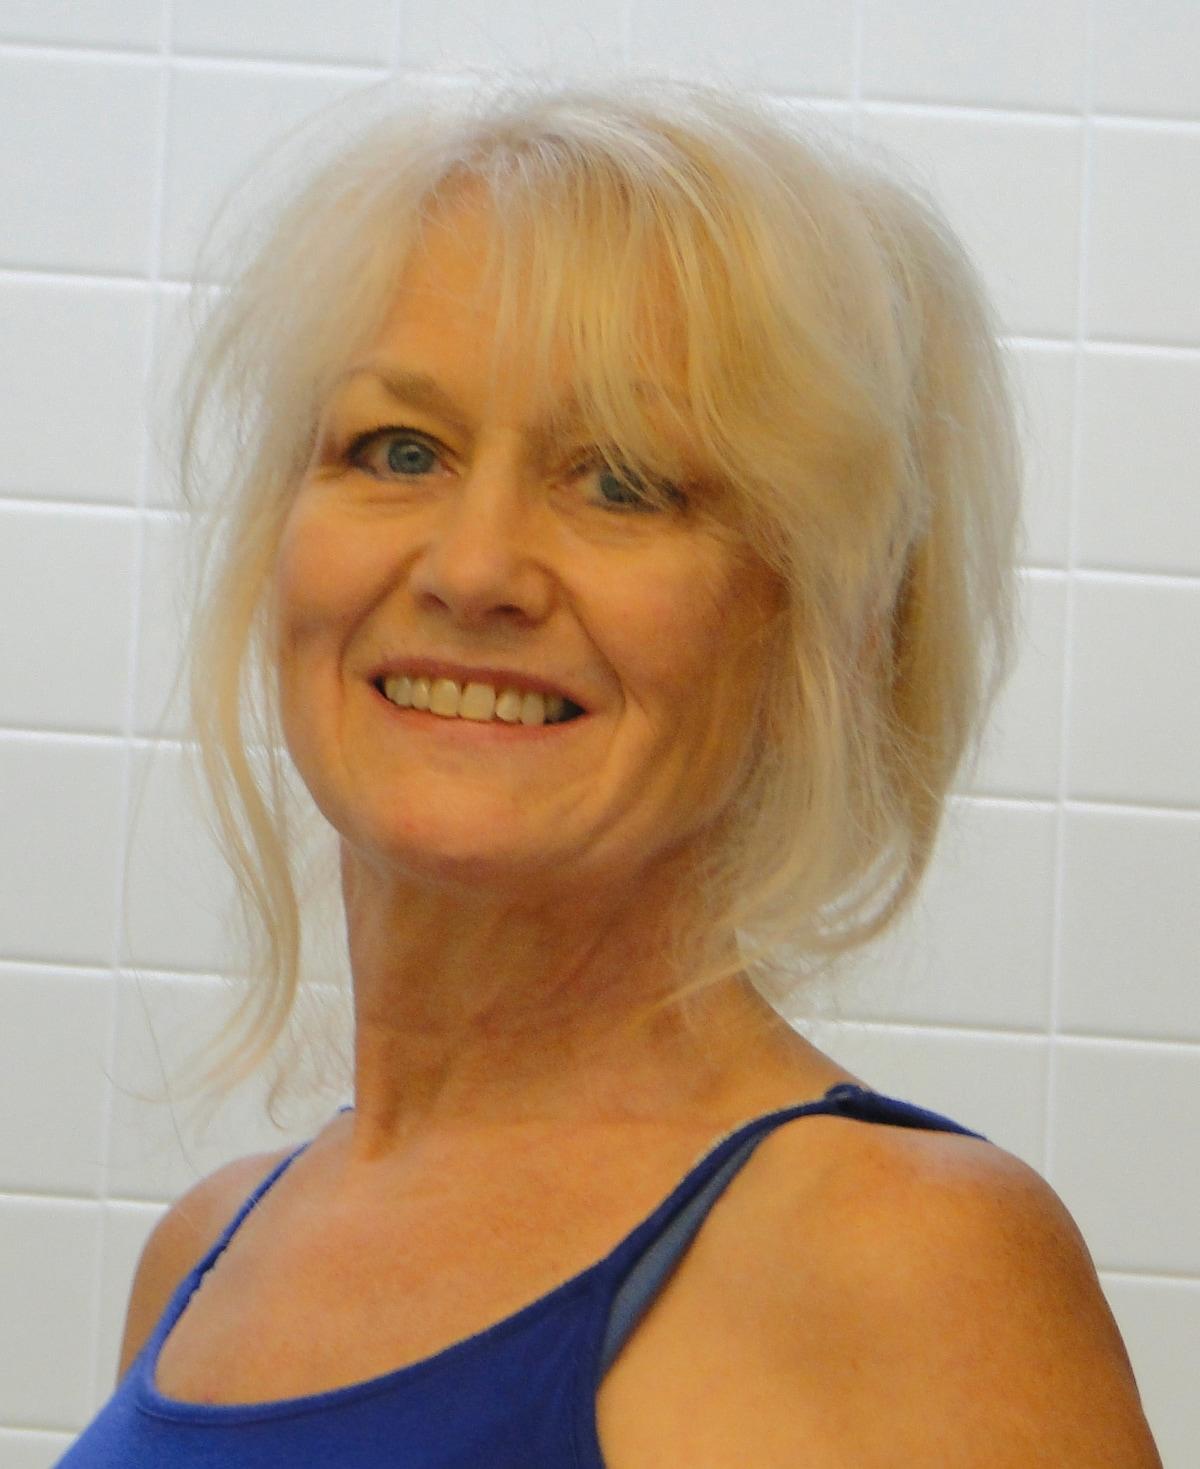 Linda from Sunnyvale